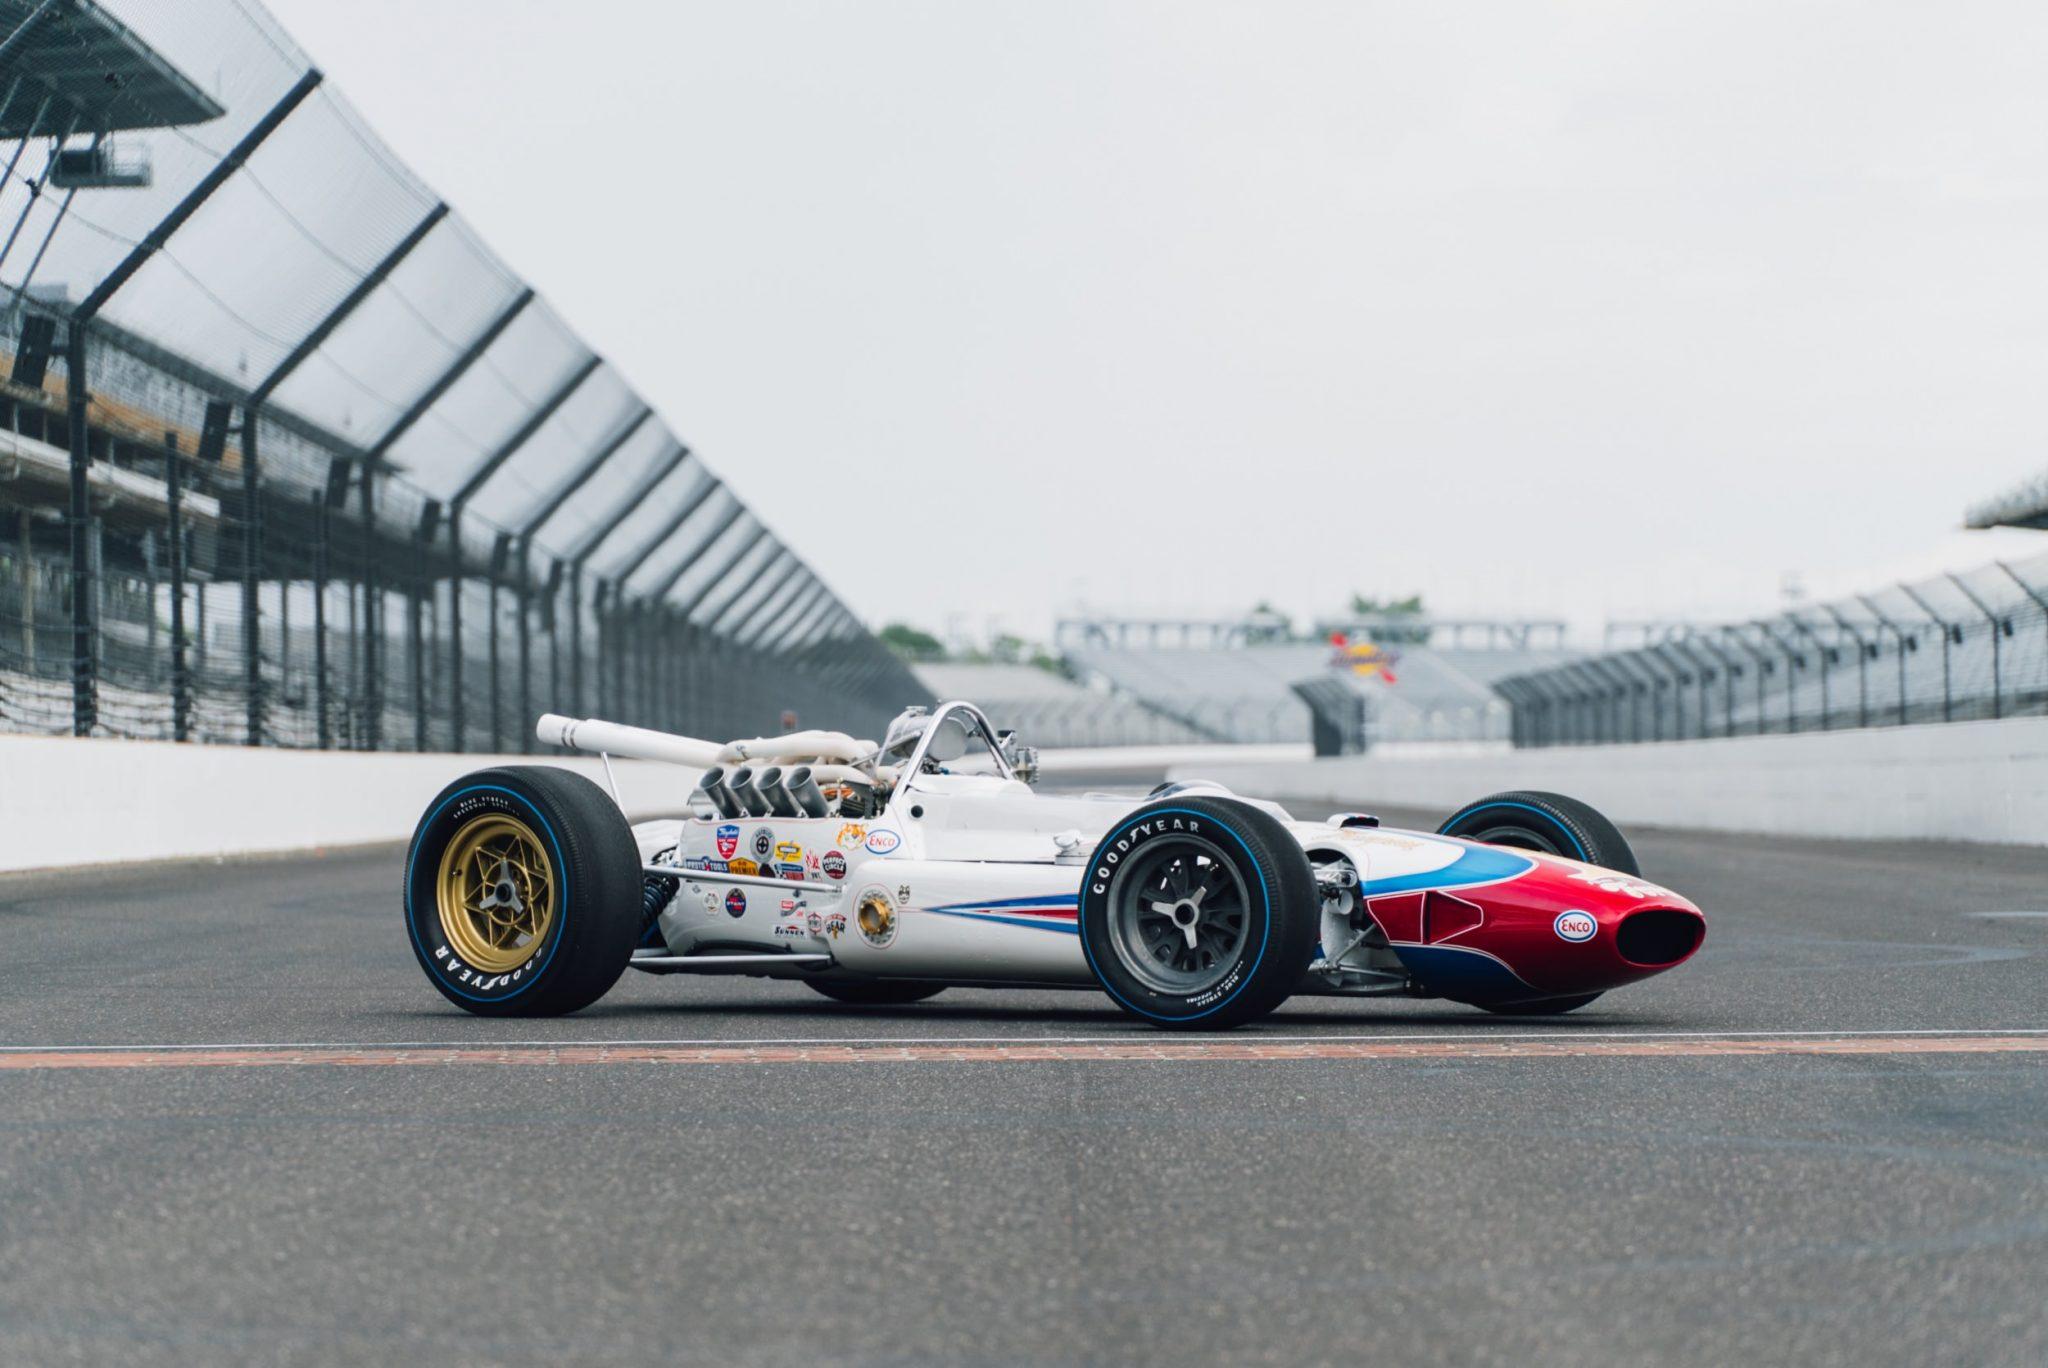 Walter Goodwin Race Car Restorations